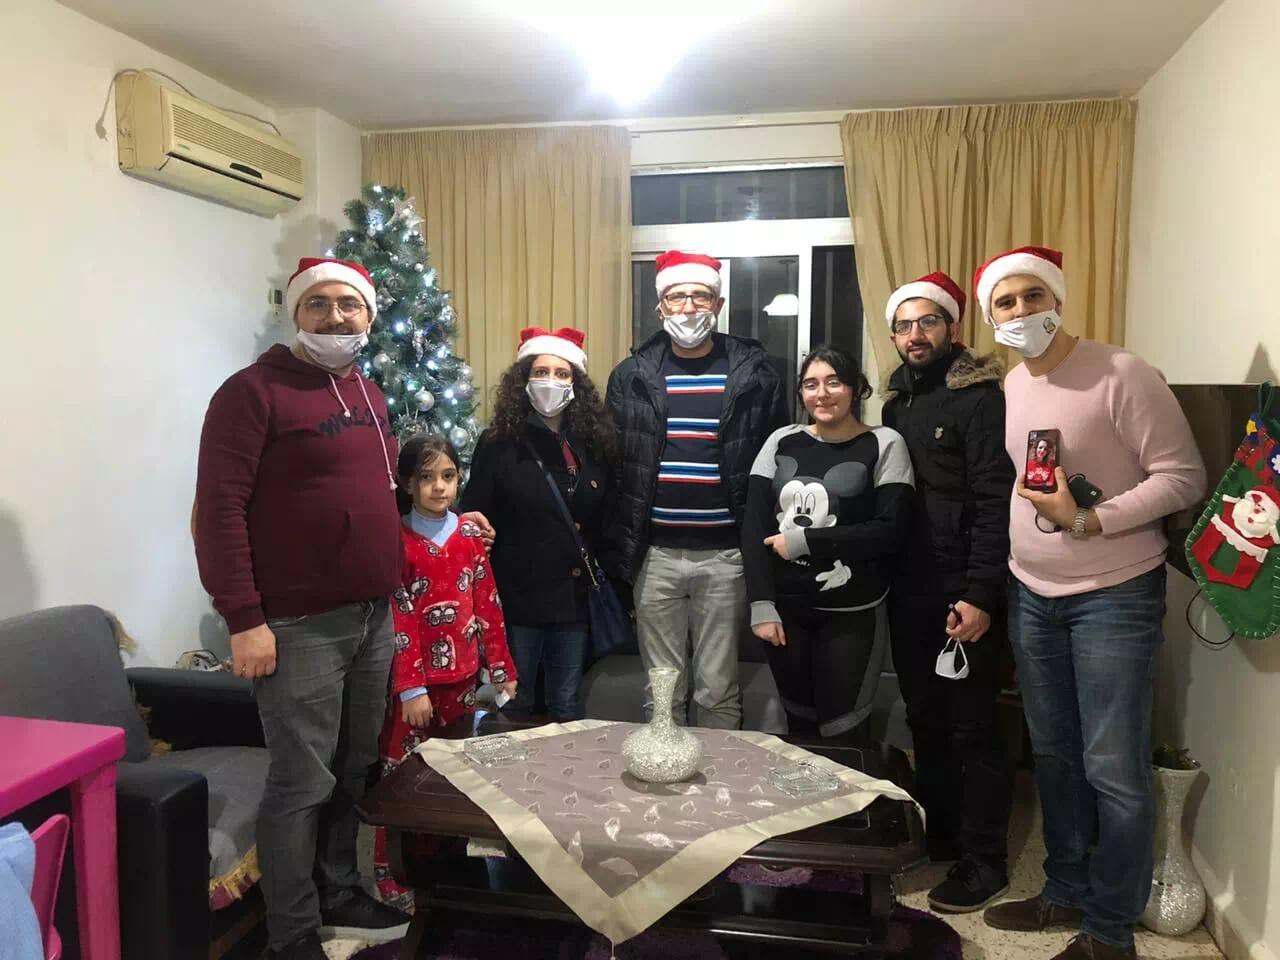 https://eundemia.sirv.com/Images/christmas/456924.webp